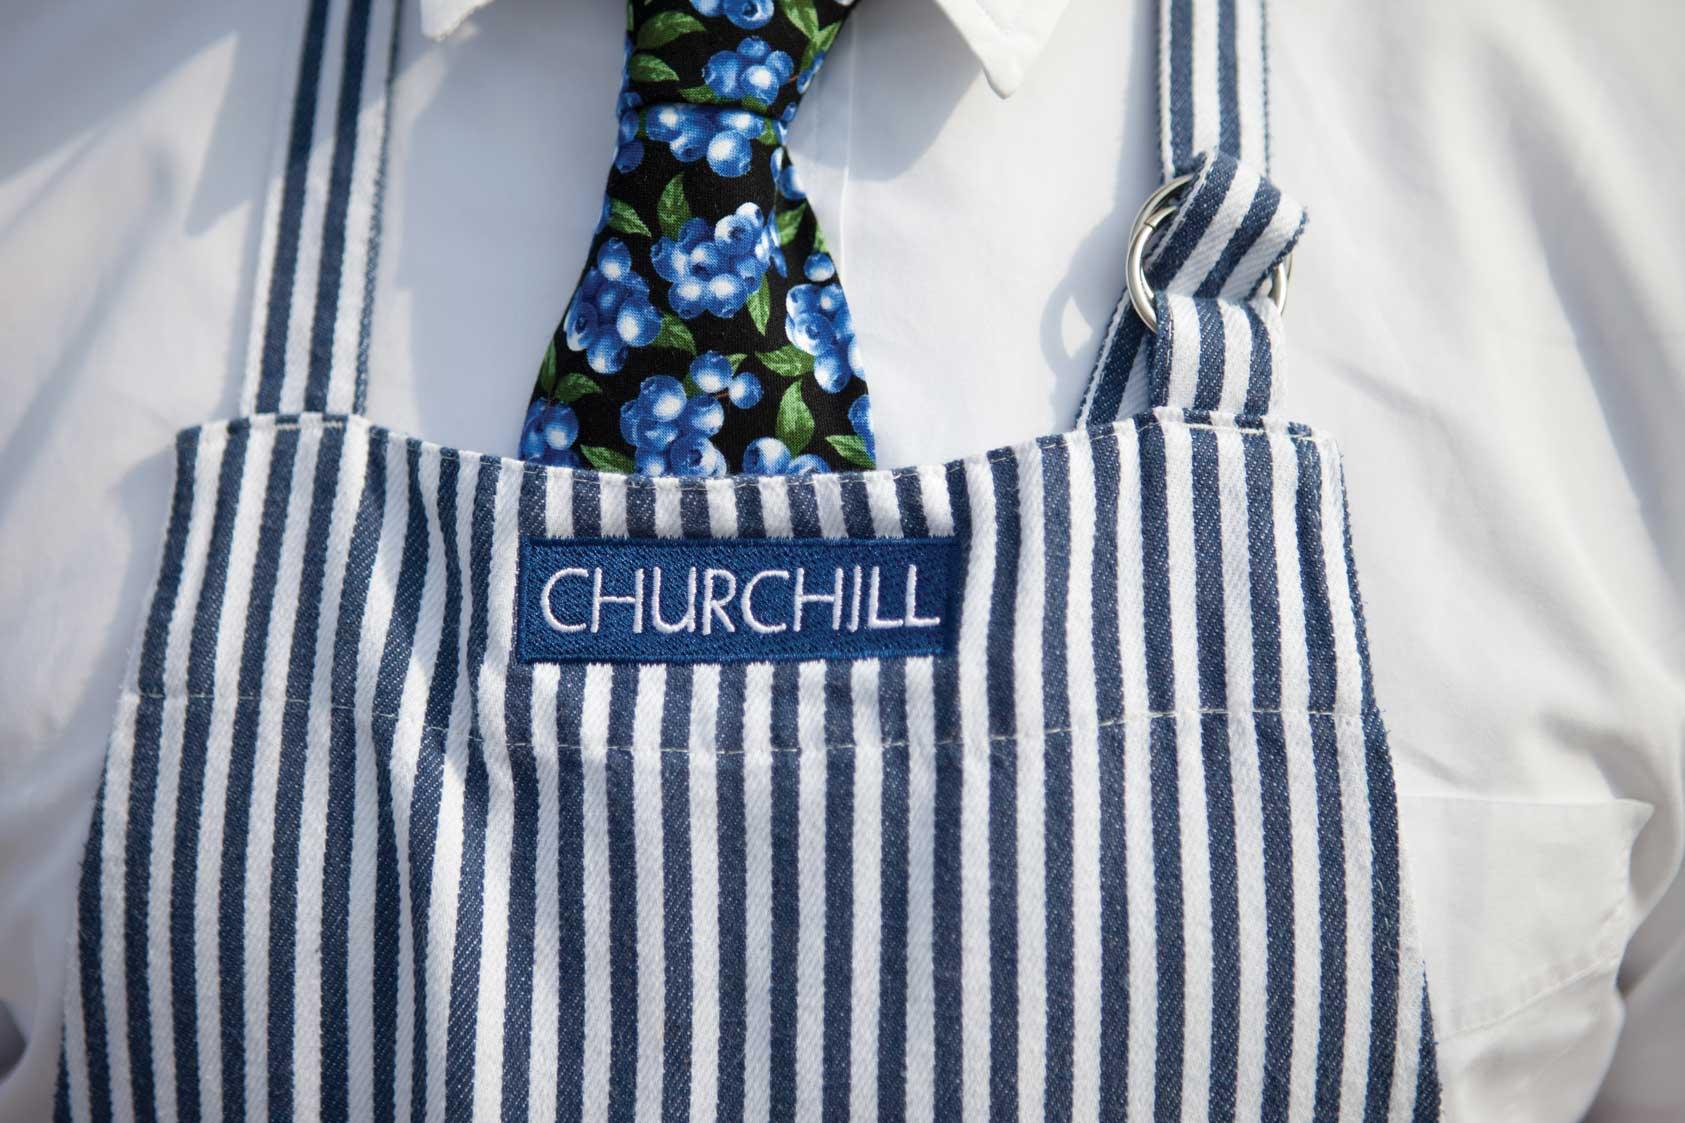 Churchill Events President Craig Williams